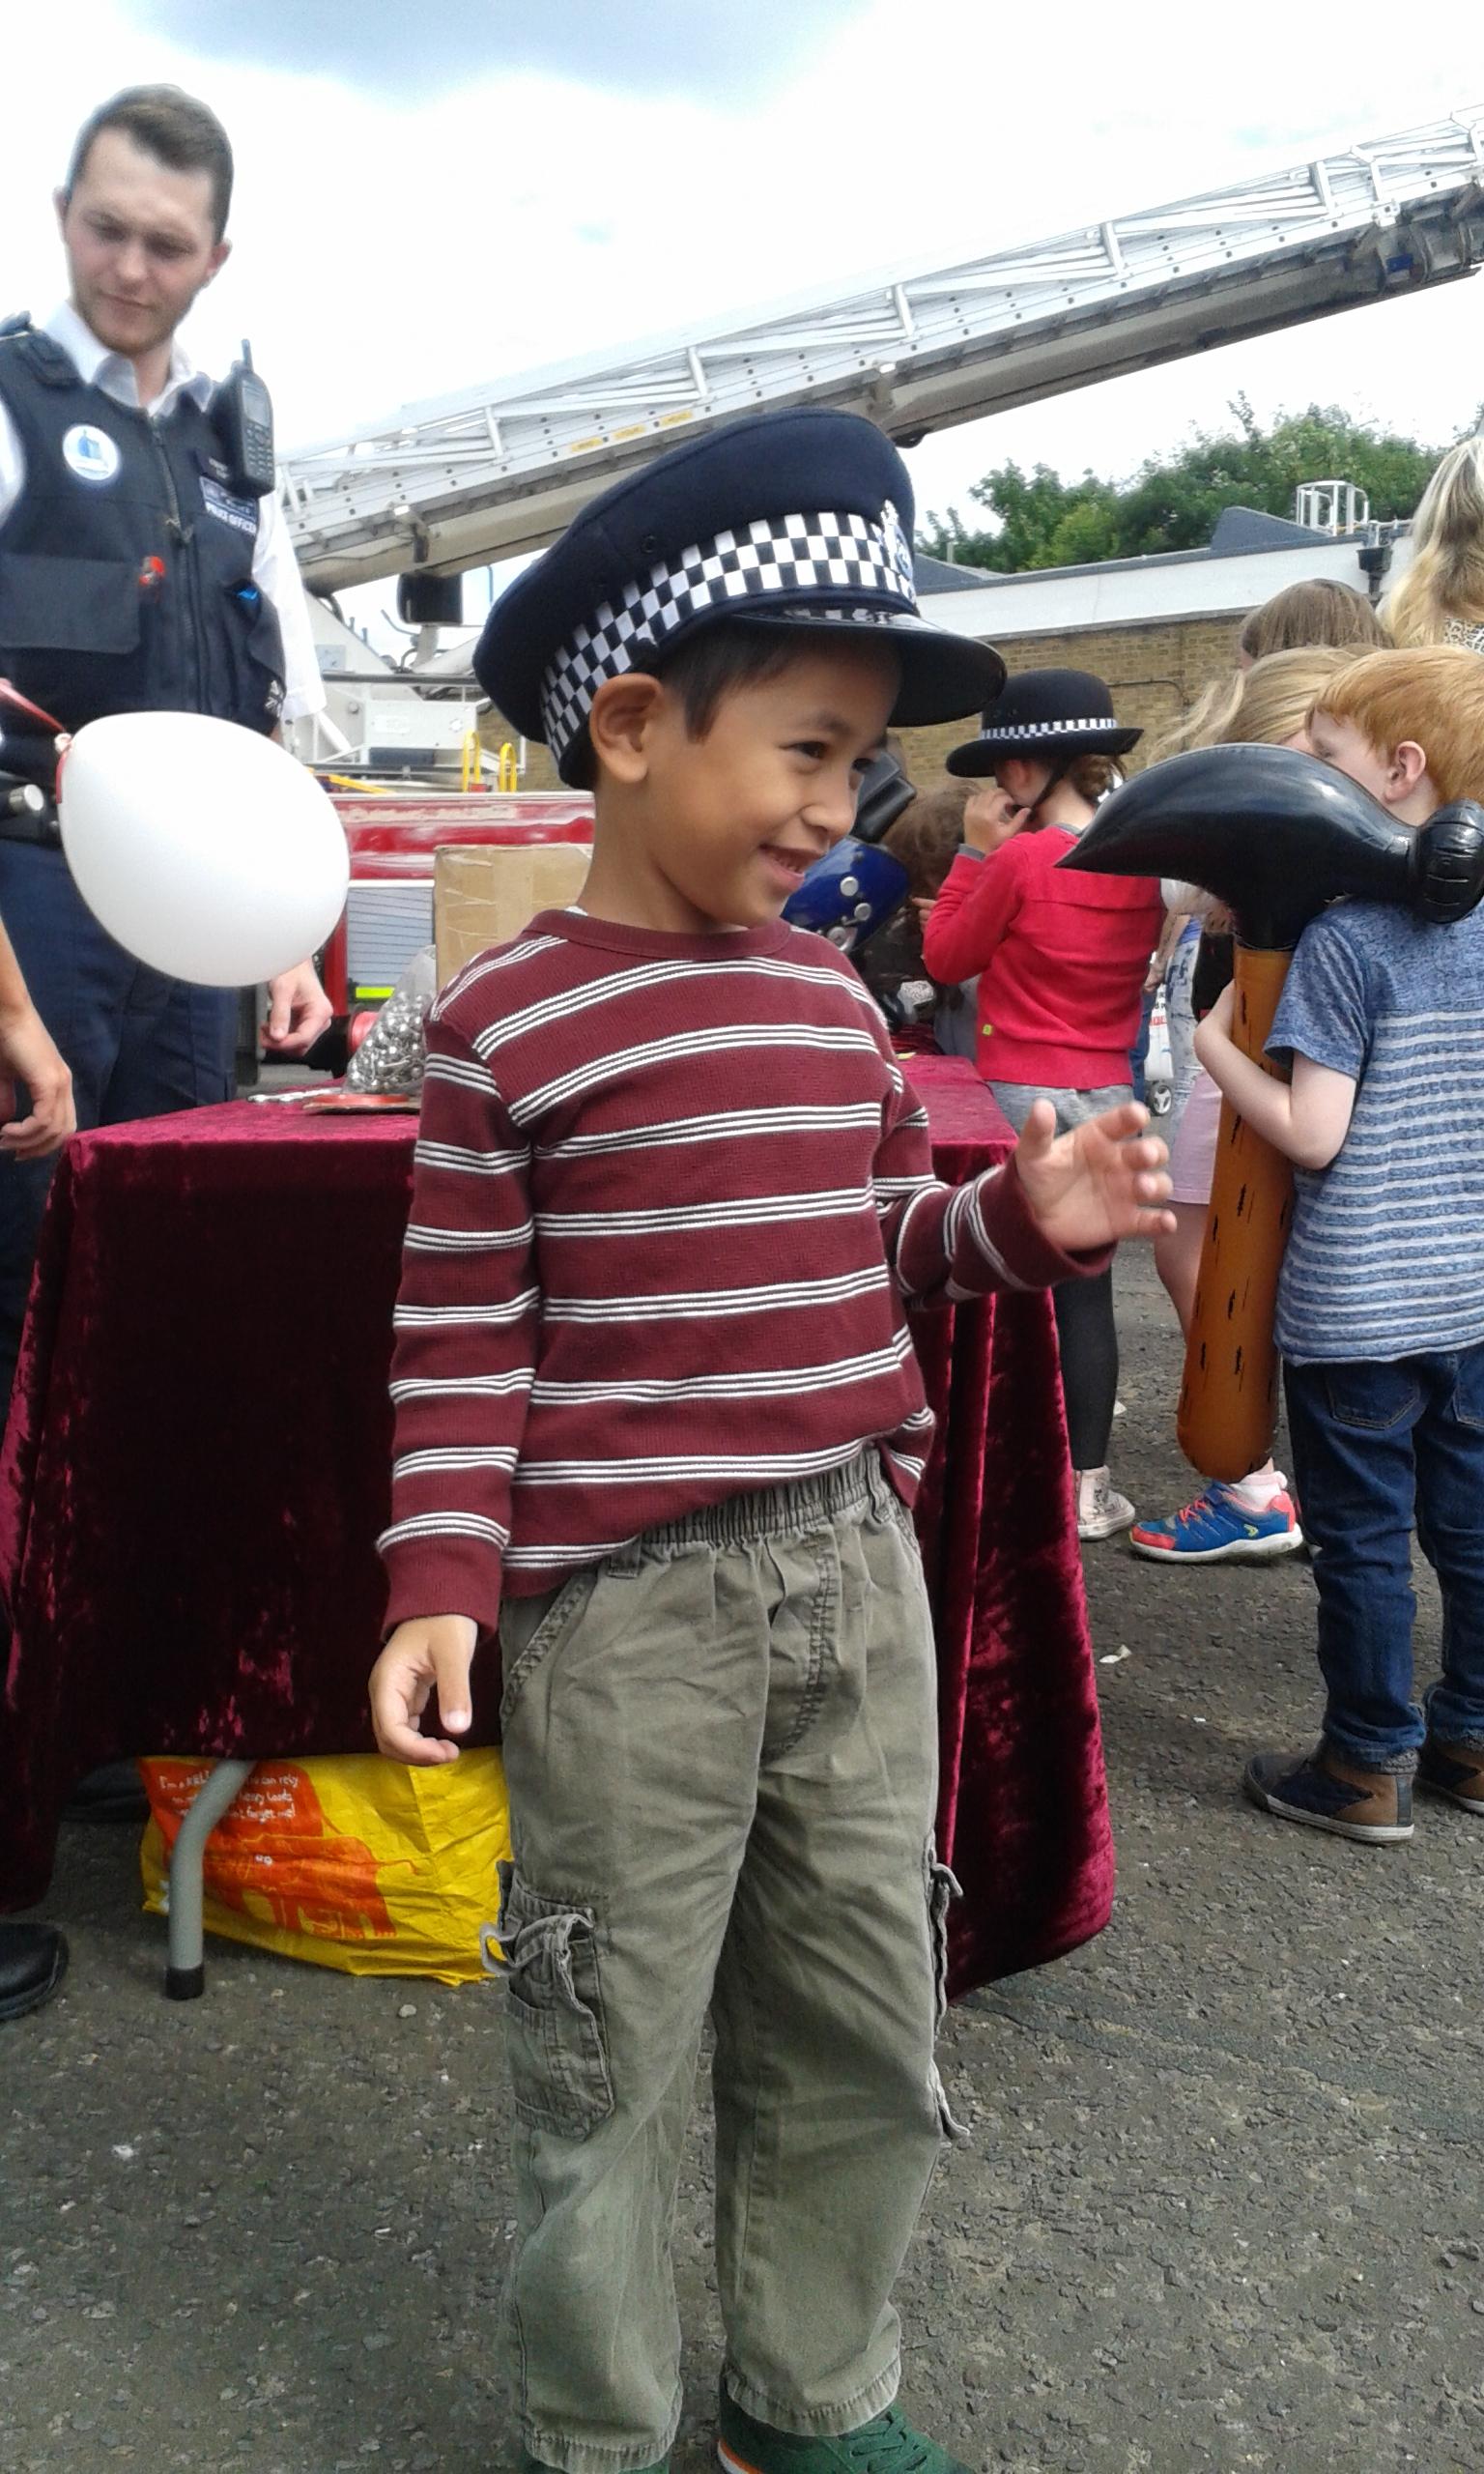 di acara open house metropolitan police dan london fire brigade